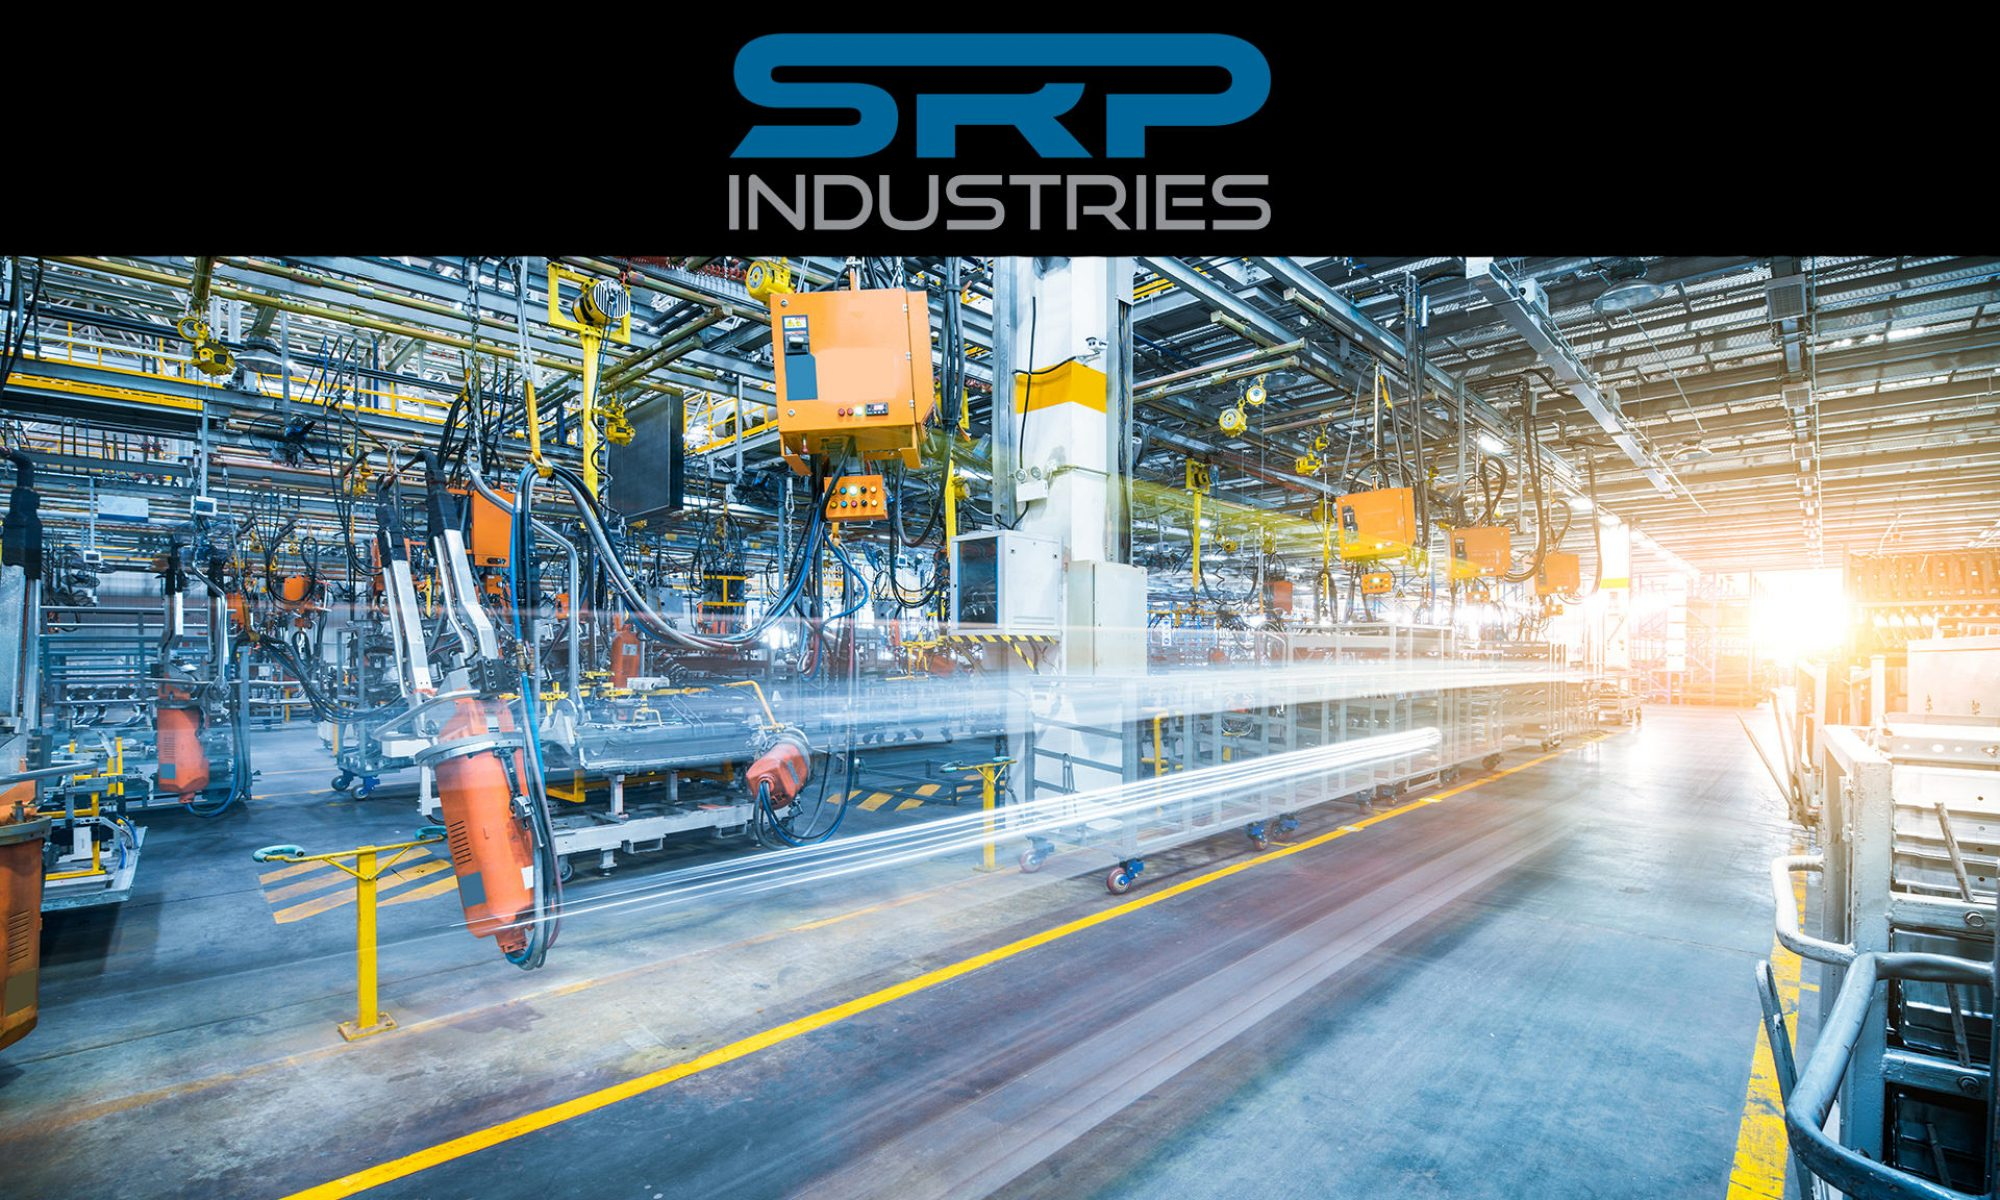 SRP Industries